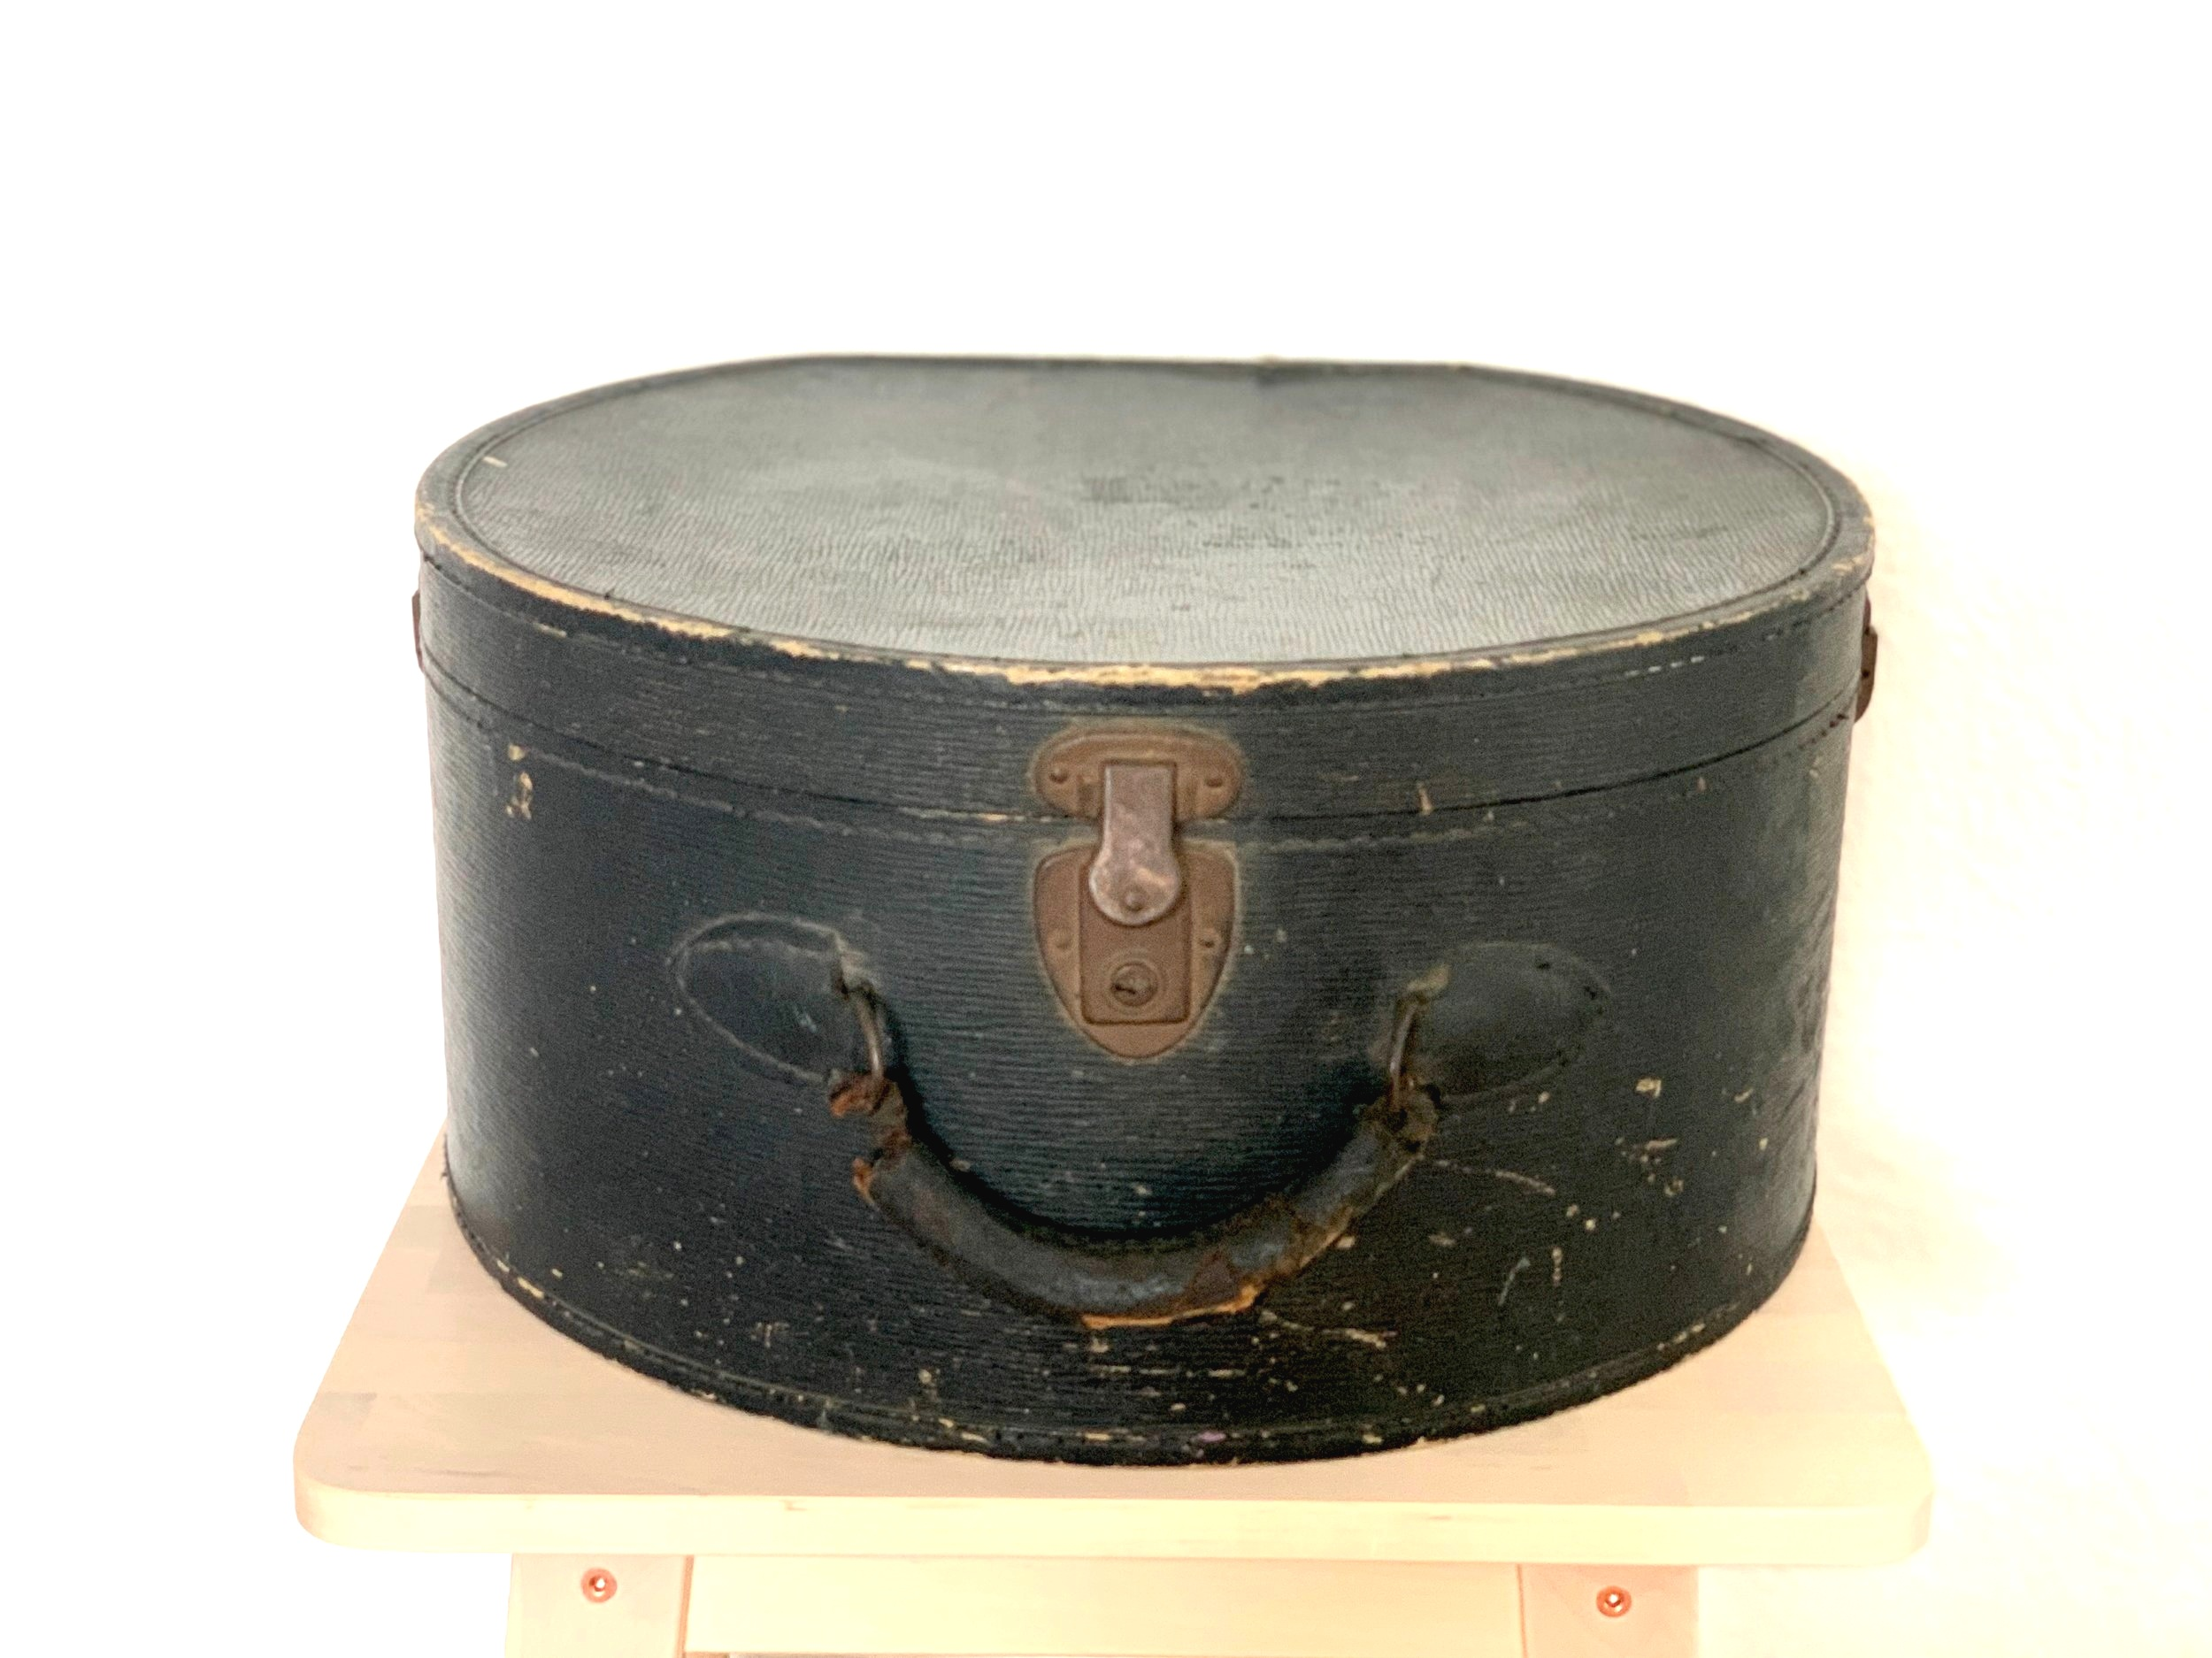 Vintage Hatbox $8